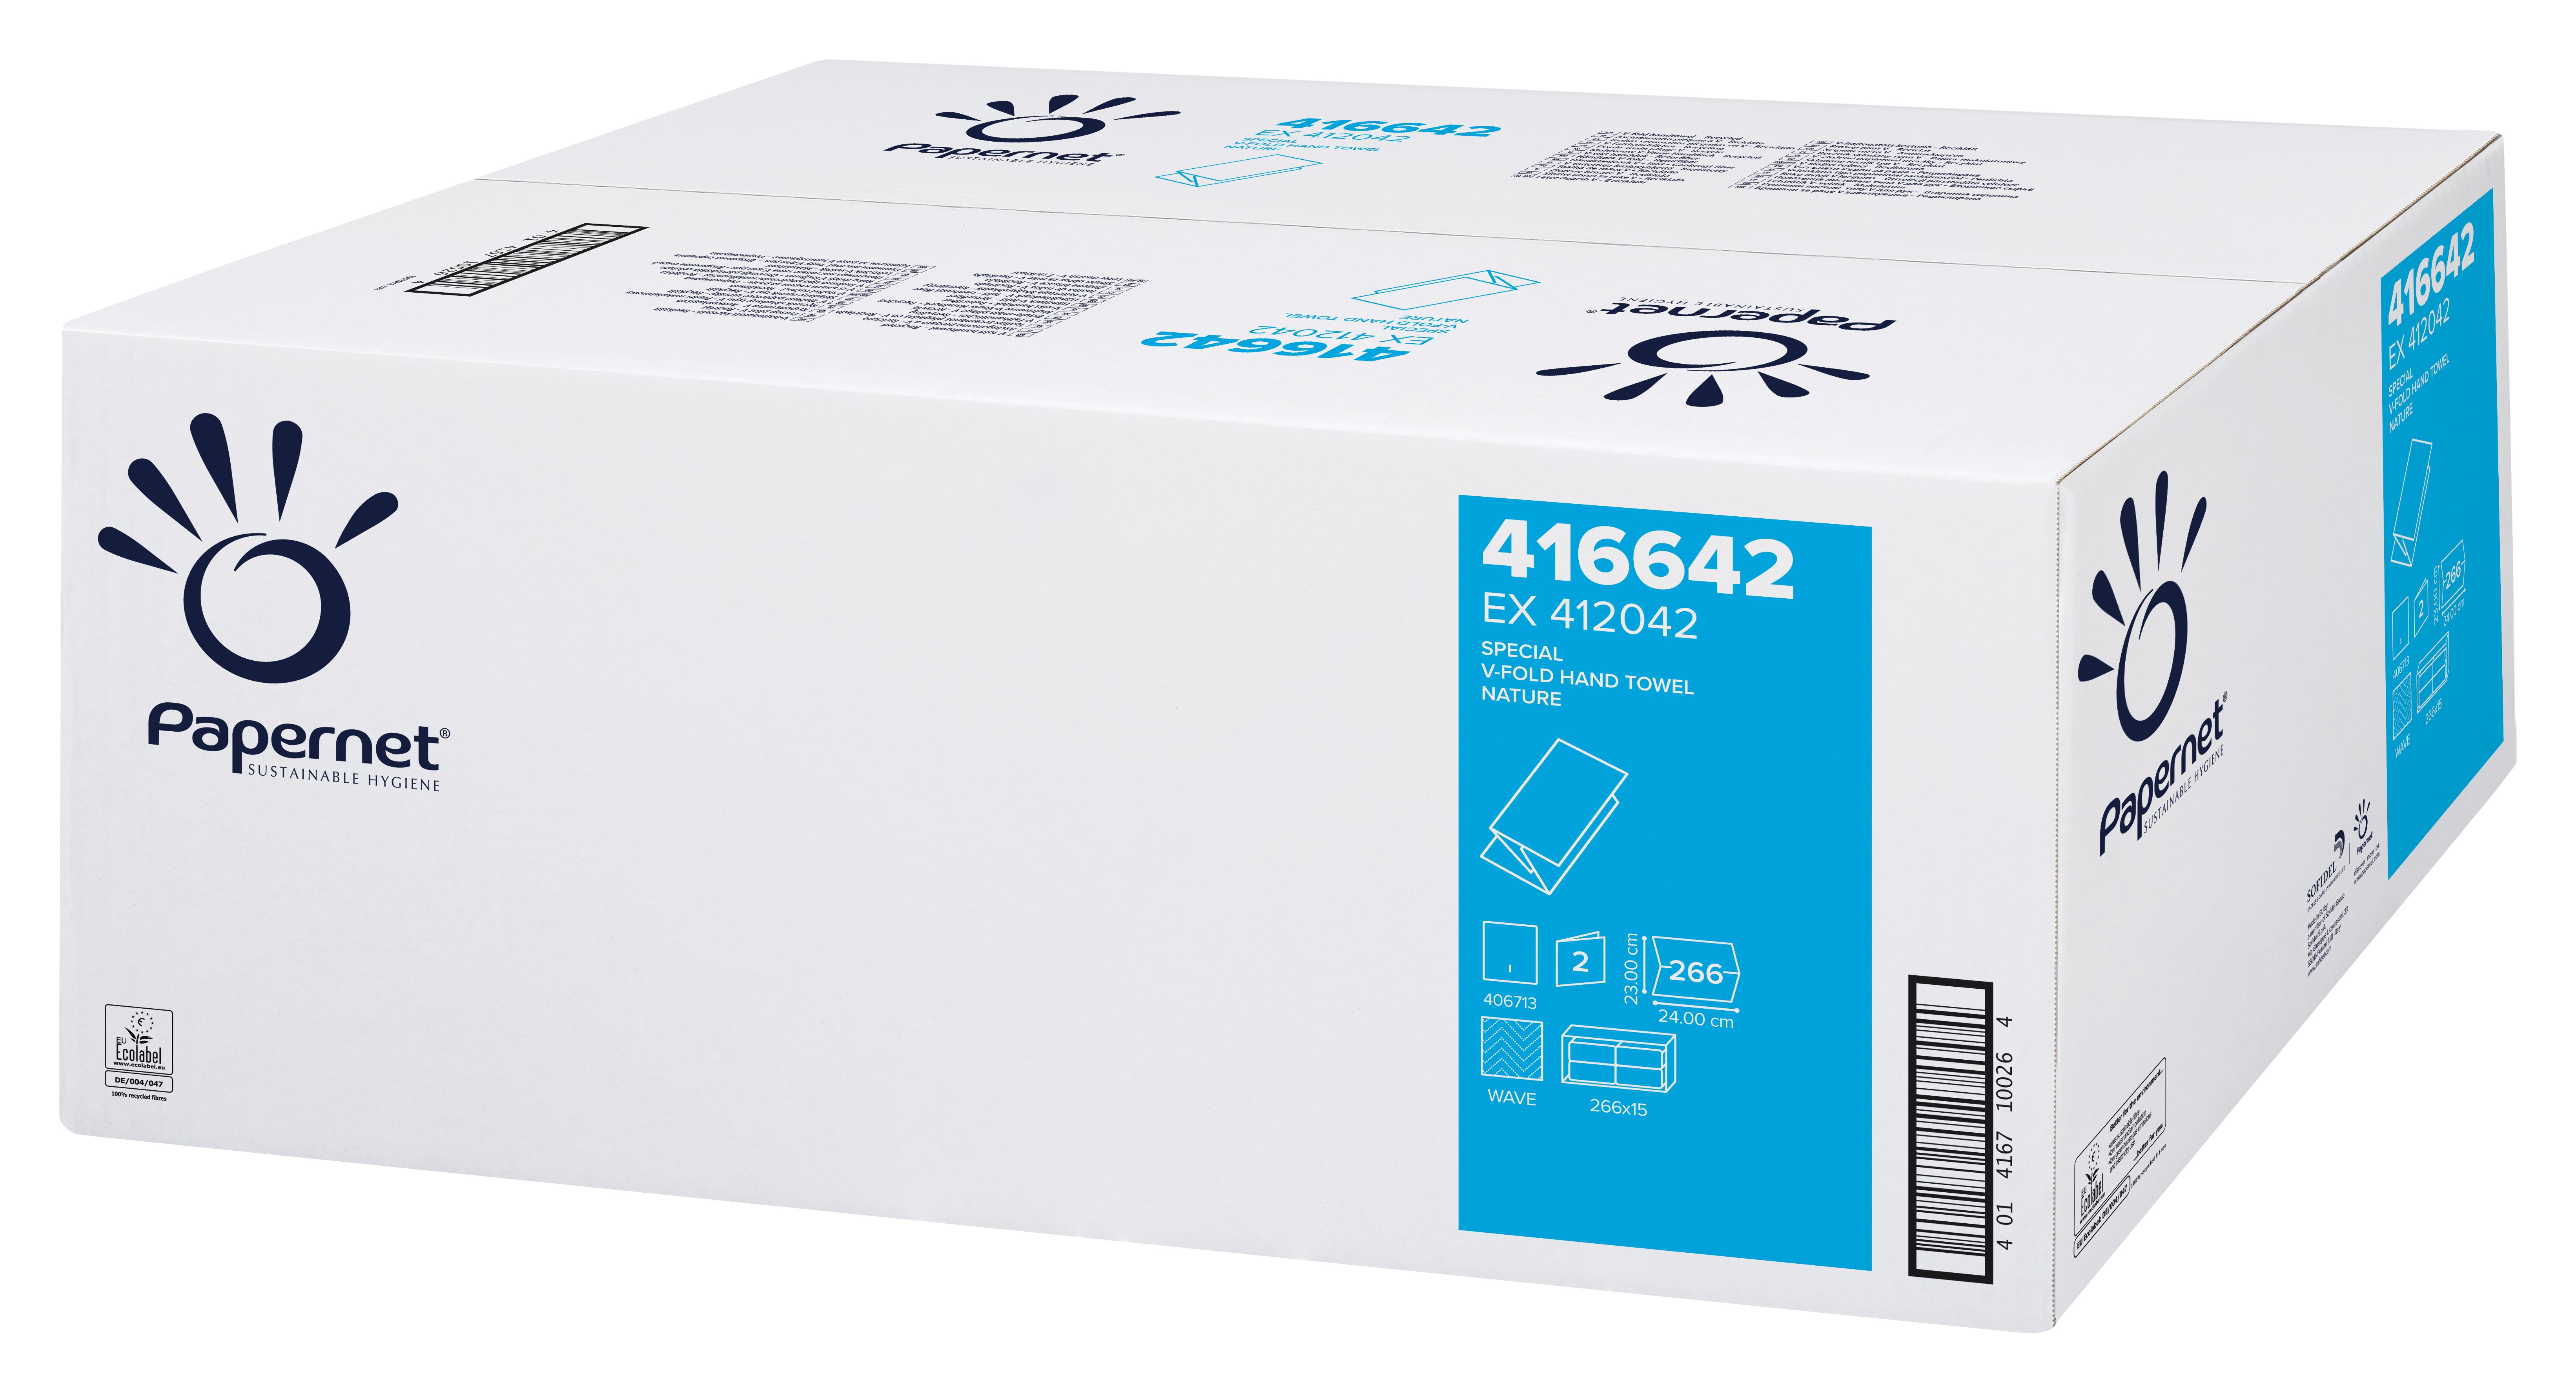 Papernet® Lehtkätepaber, V, kastis:15pk x 266 lehte, 2-kihiline, loodusvalge